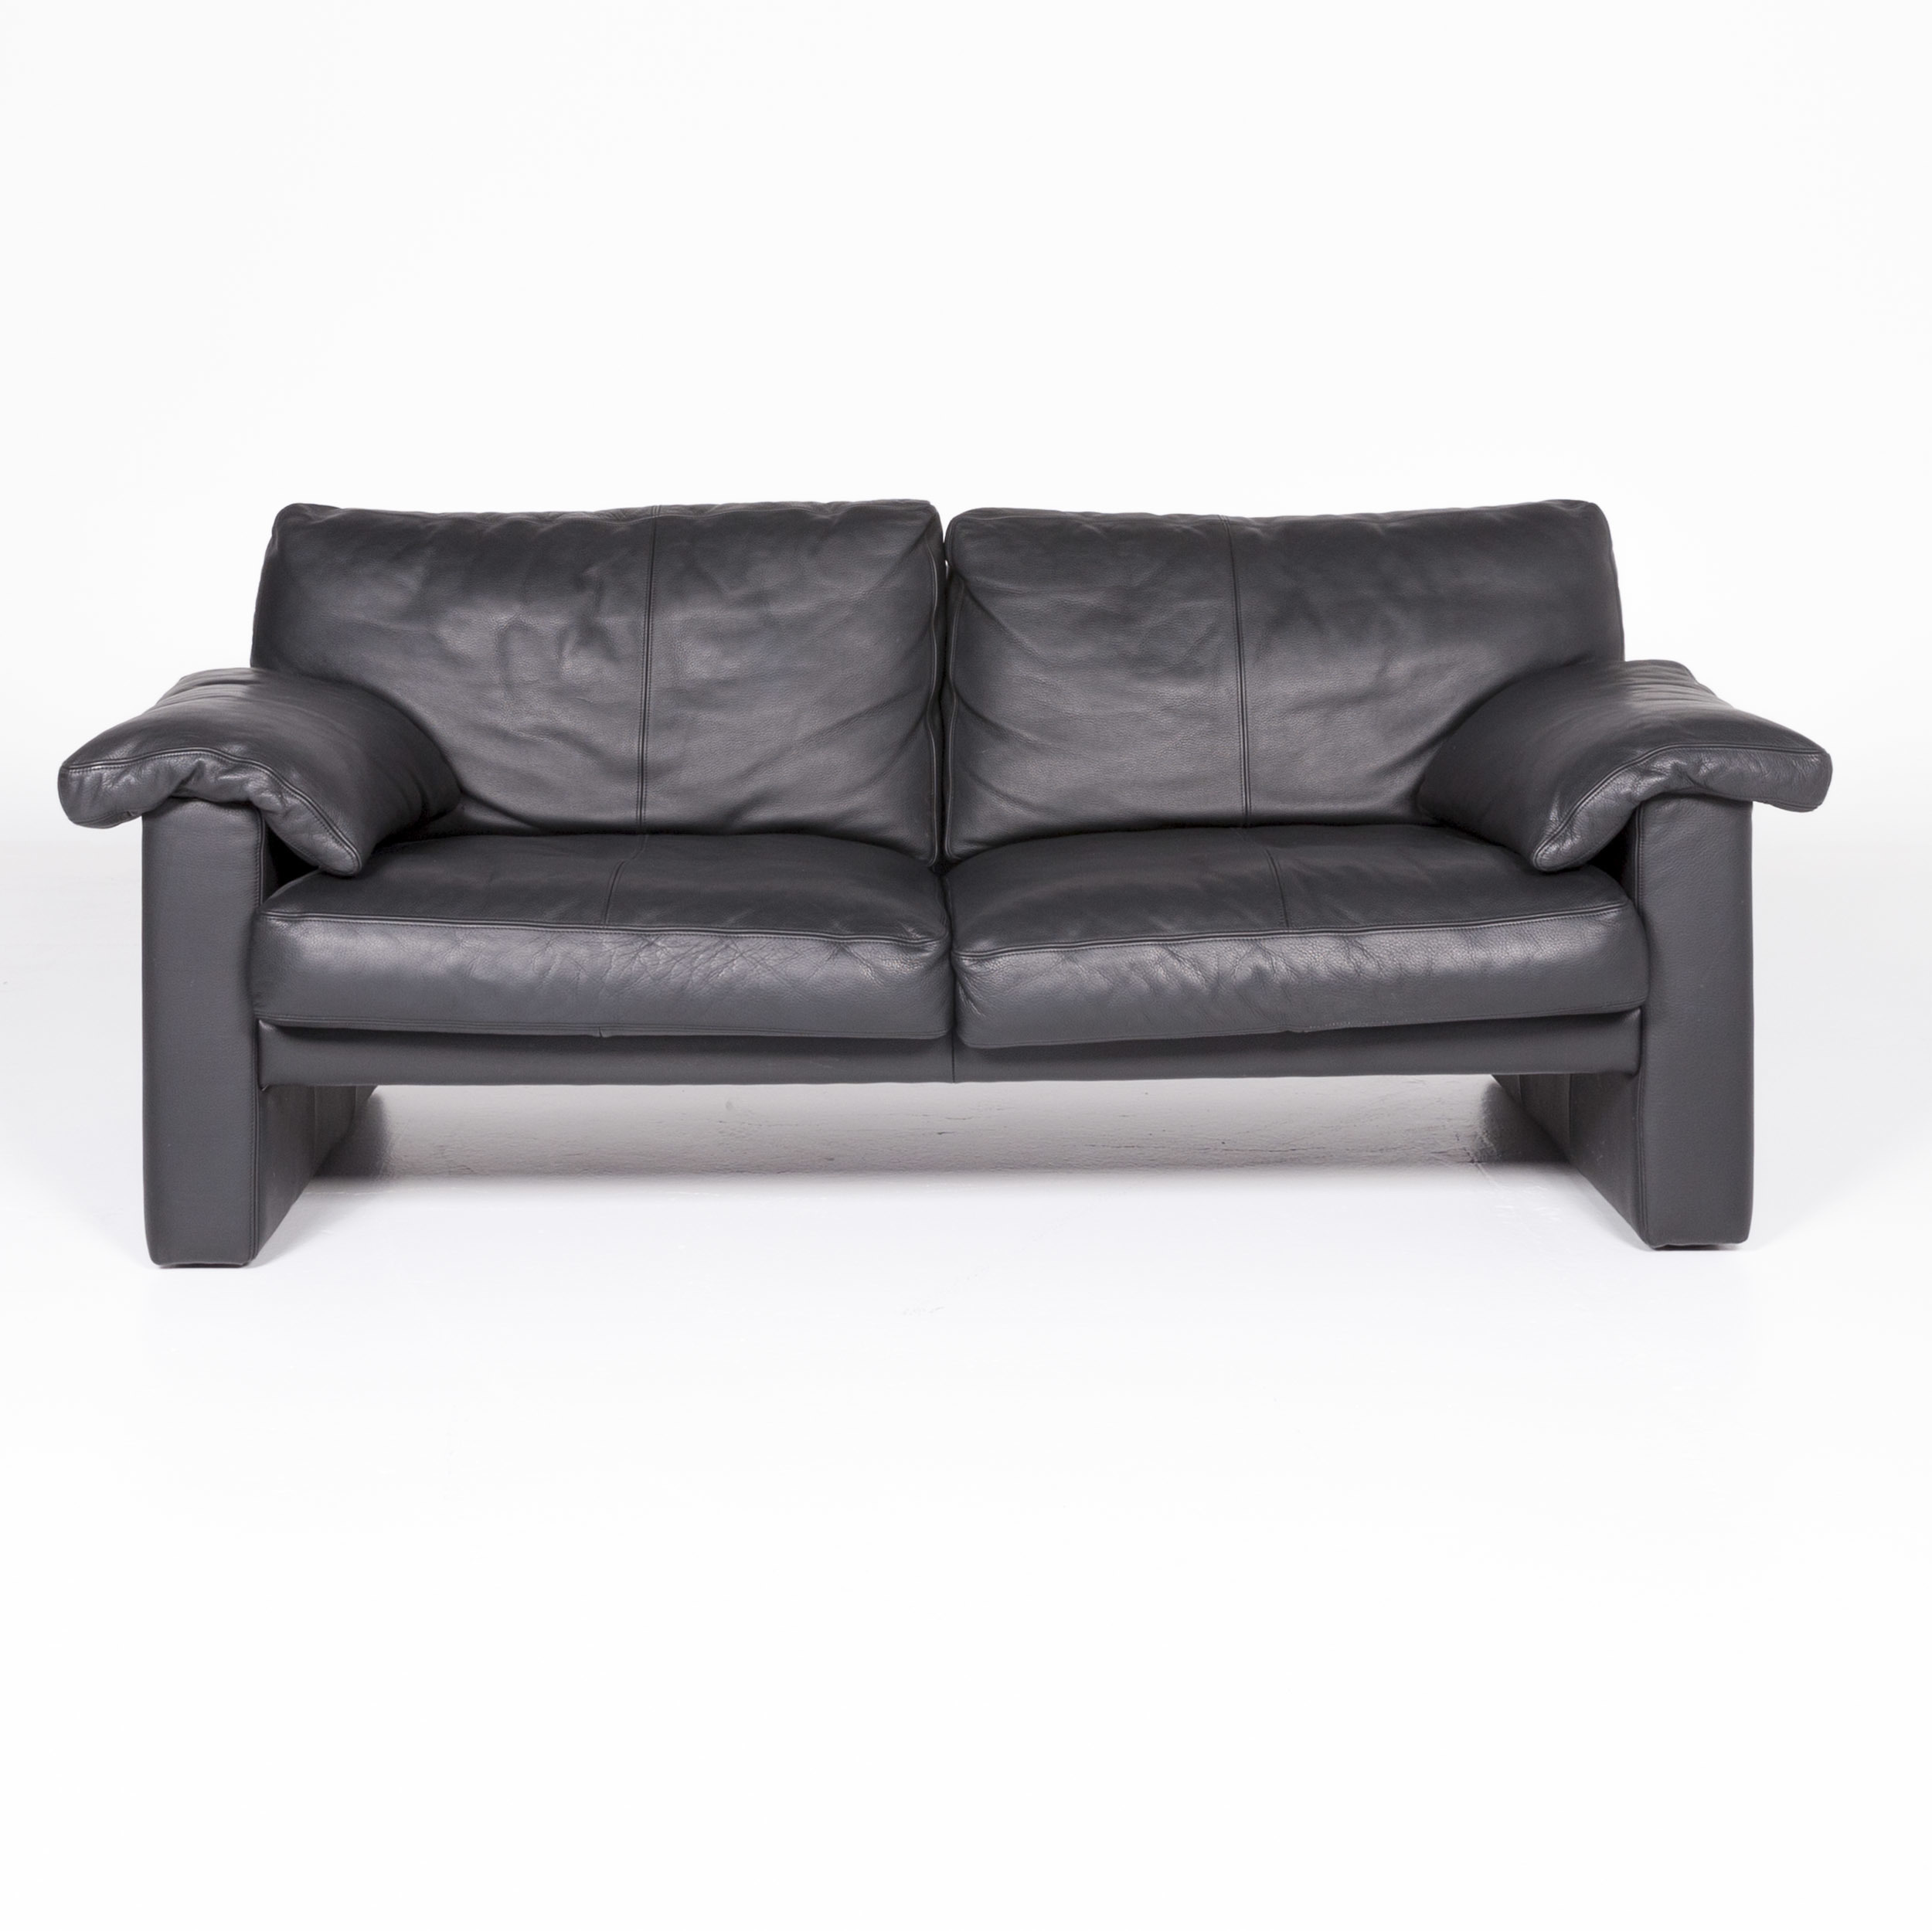 Erpo Cl 300 Designer Leather Sofa Black Genuine Leather Two ...